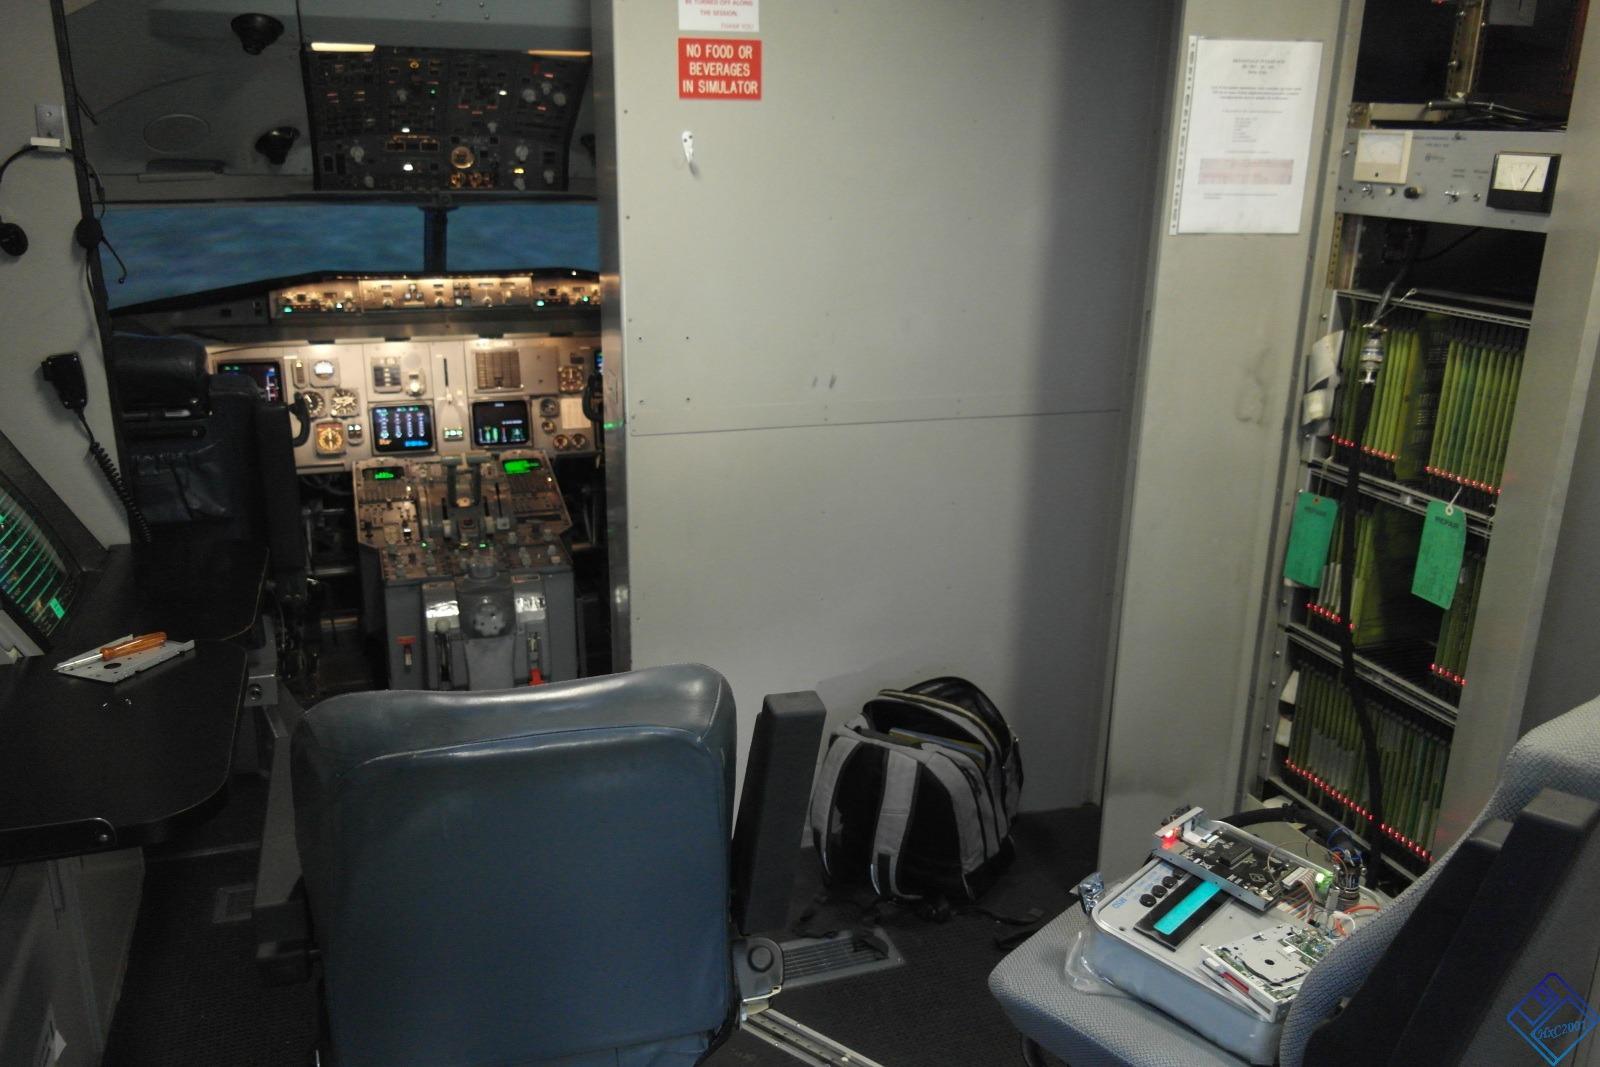 HxC2001 : HxC Floppy Emulator Airbus A330 / A340,Boeing 737,Fokker